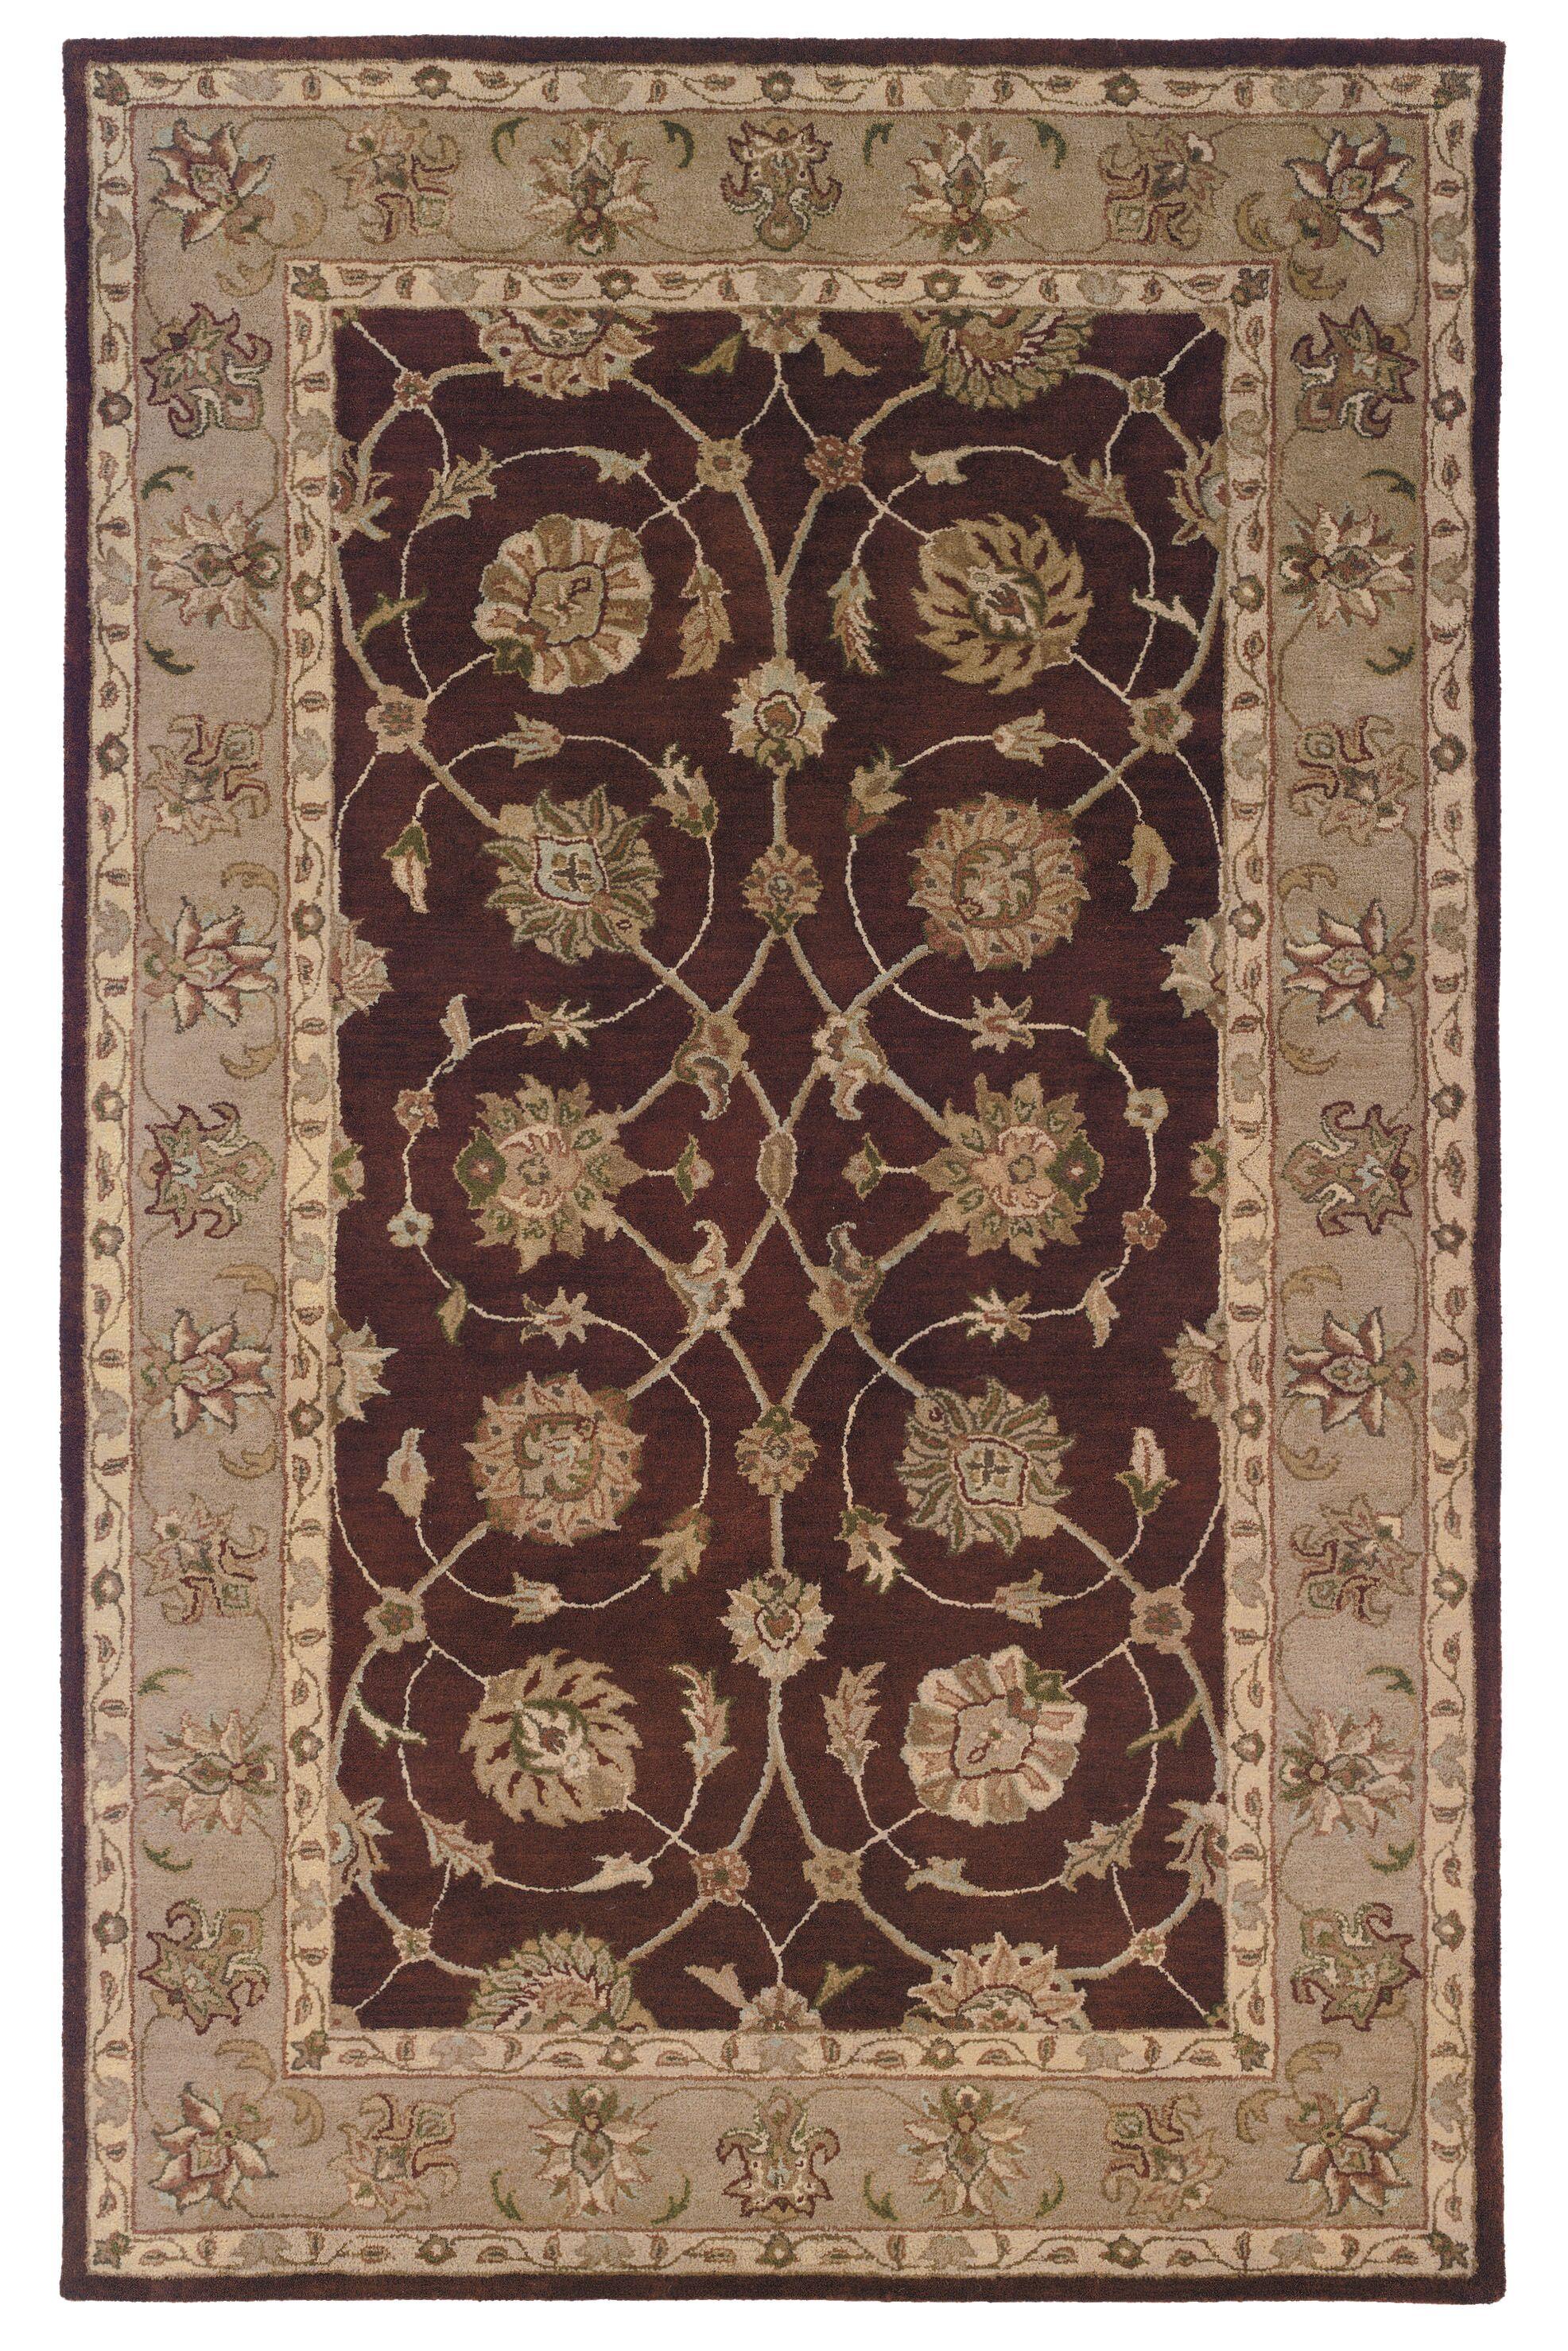 Gattis Hand-Tufted Brown/Beige Area Rug Rug Size: Rectangle 9' x 12'